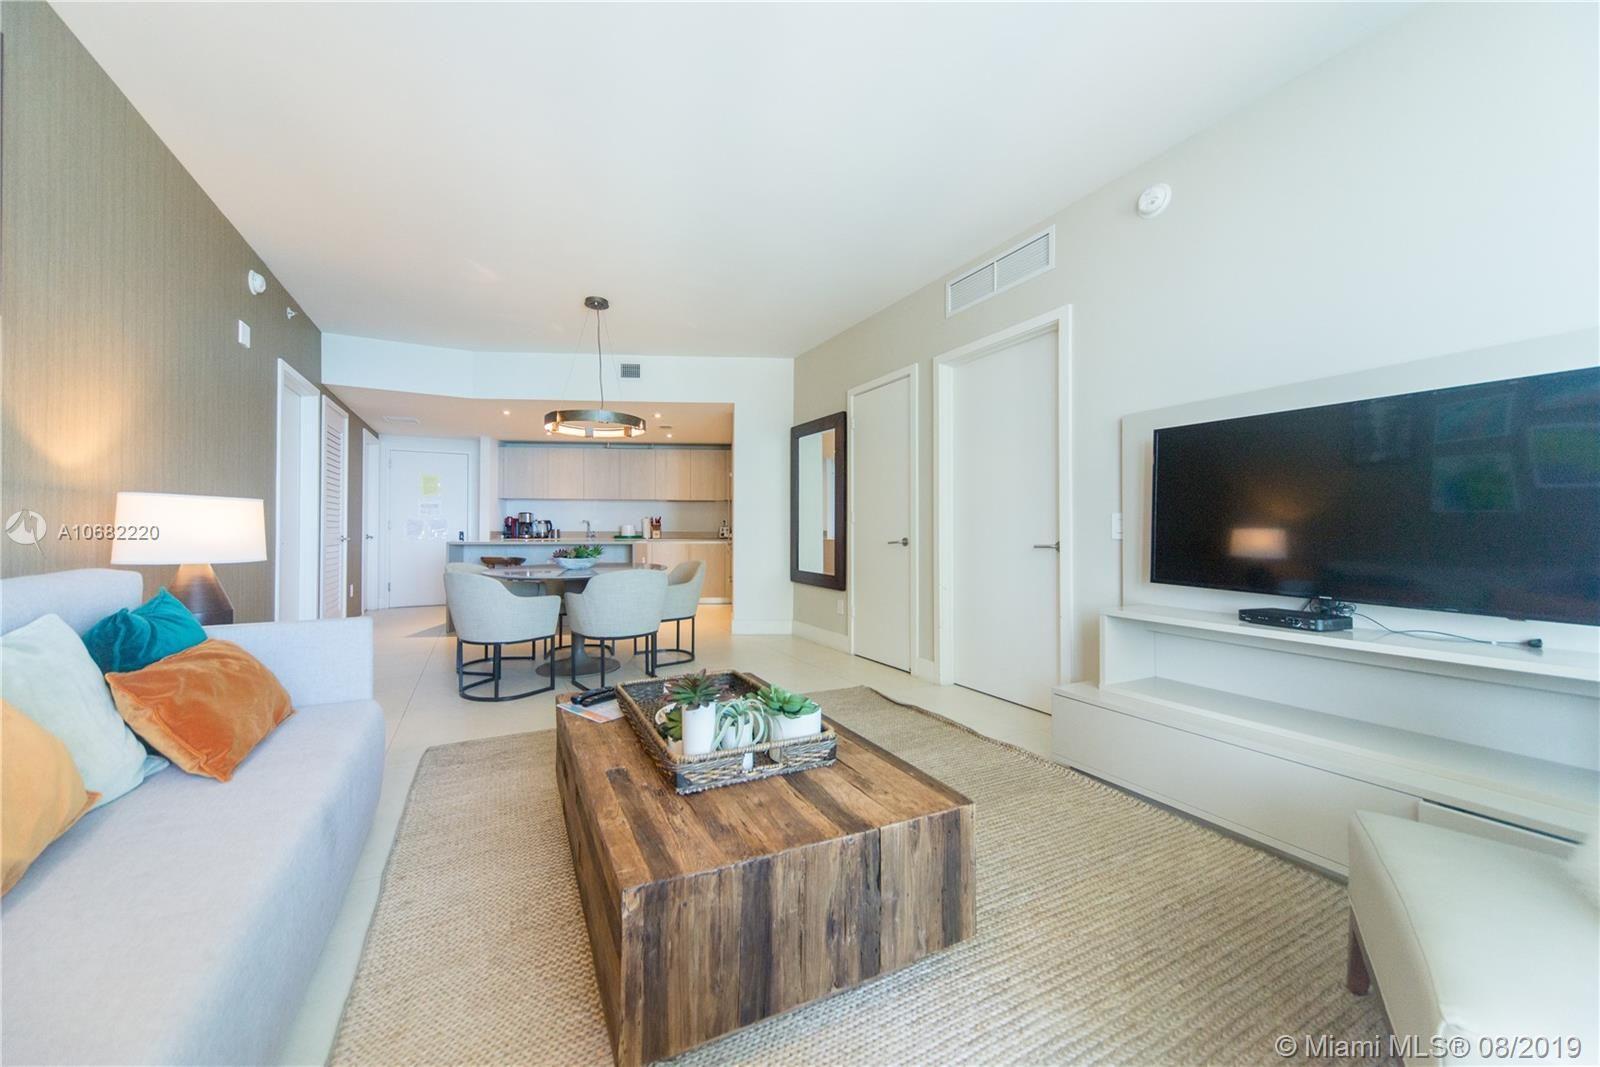 property photo Residencial, Vender casa, Condominio